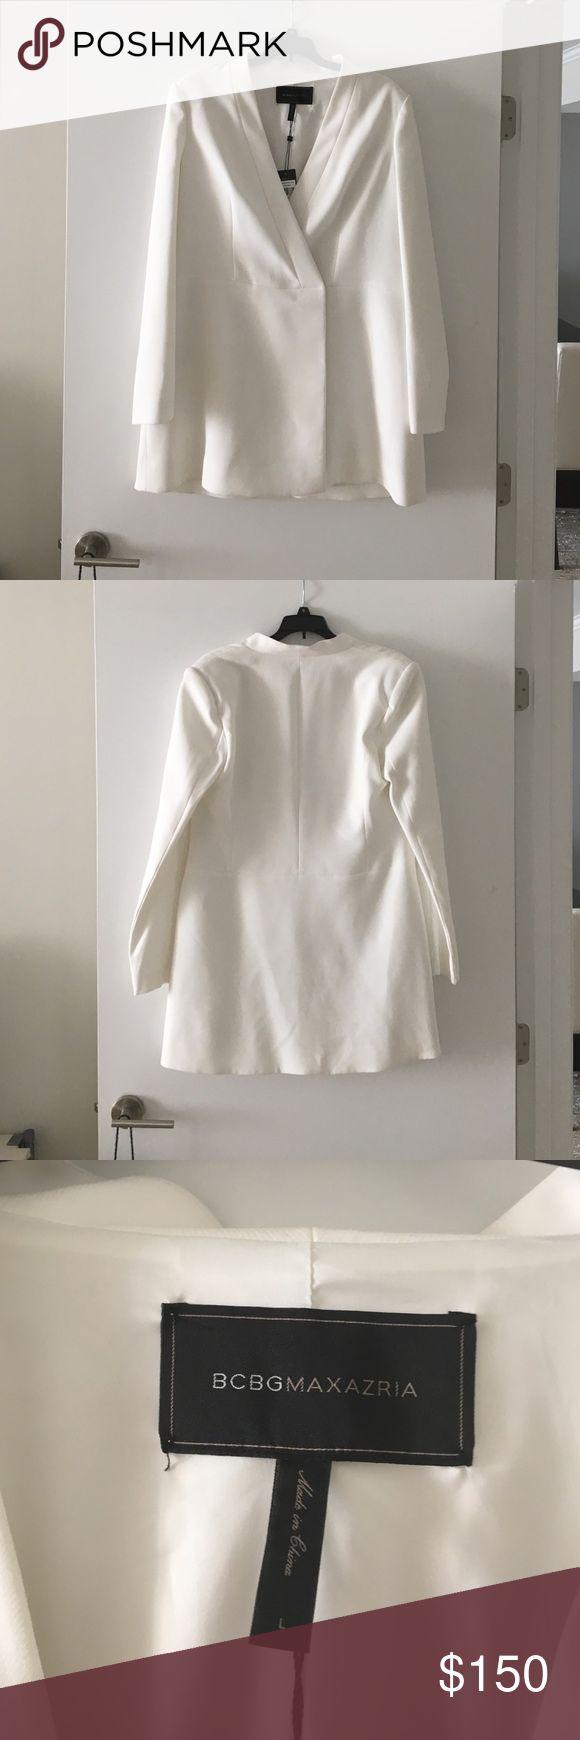 BCBG Tux Dress BCBG 'Waleska' Tuxedo Dress/Coat BCBGMaxAzria Dresses Mini